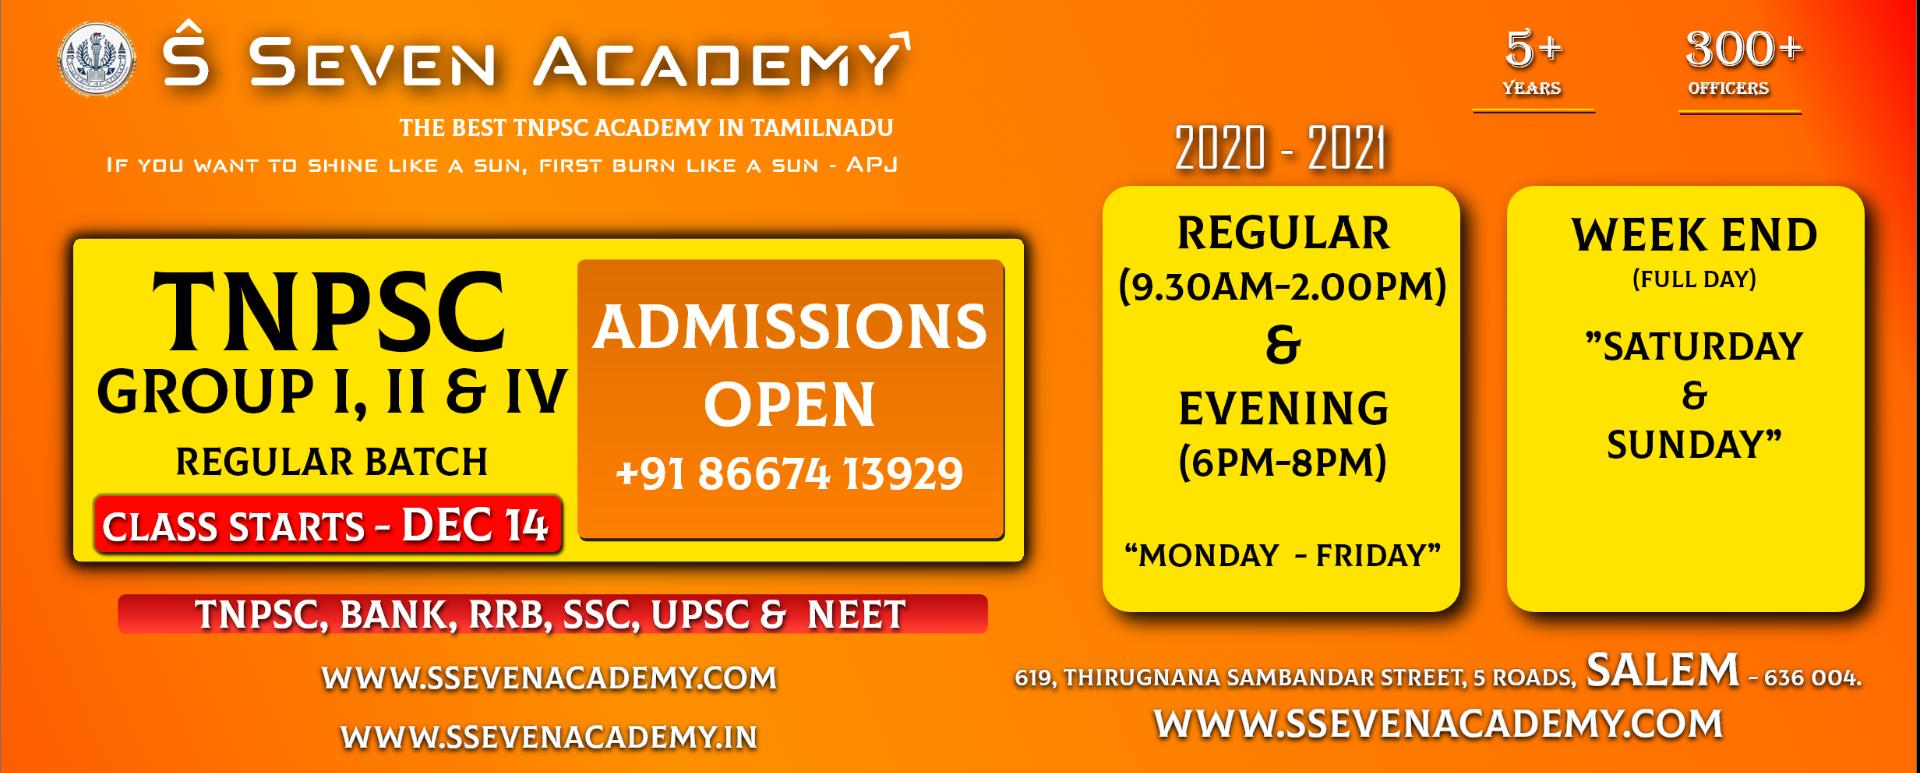 Tnpsc, tnpsc, Tnpsc coaching centre near me, Tnpsc coaching centre fee, Salem tnpsc academy, Tnpsc salem, Tnpsc portal, Tnpsc study plan, Tnpsc, tnpsc salem, TNPSC Exam, tnpsc group 1, Tnpsc group 2, Tnpsc group 4, Tnpsc Exams, S Seven Academy, Tnpsc group 4 exam date 2021, Tnpsc group 4 exam date 2021 tamil, Tnpsc study material, Tnpsc syllabus 2021, Tnpsc school books, Tnpsc samacheer books, Salem tnpsc coaching centre, Tnpsc coaching center in salem, Tnpsc coaching centre in salem, Best tnpsc coaching centre salem, Best tnpsc coaching centre salem, Best tnpsc coaching centres in salem, Best tnpsc coaching centres salem, Best tnpsc coaching institute in salem, Best tnpsc coaching institute salem, Best tnpsc exam coaching institute in salem, Salem tnpsc academy, Adhiyamaan tnpsc salem, Race tnpsc salem, Pothigai tnpsc salem, Vetri tnpsc salem, Tnpsc coaching salem, Future vision tnpsc salem, Phoenix academy tnpsc salem, Tnpsc coaching classes in salem, salem, tamil nadu, Academy in salem, Academy, Best academy in salem, Best academy, Best coaching center in salem for tnpsc, Best coaching centre in salem for tnpsc, Best tnpsc academy in salem, Best tnpsc coaching center in salem, Best tnpsc coaching centre in salem, Best tnpsc coaching center salem, Best tnpsc coaching centre in salem, Best tnpsc exam salem, Best tnpsc exams coaching institute in salem, Best tnpsc exams coaching institute salem, Best tnpsc exams salem, Best tnpsc group 1 coaching centre in salem, Best tnpsc group 2 coaching centre in salem, Best tnpsc group 2 coaching centre in salem, Best tnpsc group 4 coaching centre in salem, Best tnpsc group vao coaching centre in salem, Best tnpsc training centre in salem, Tnpsc group 1 coaching centre in salem, Tnpsc group 2 coaching center in salem, Tnpsc group 2 coaching center in salem, Tnpsc group 2 coaching centre in salem, Tnpsc group 2 coaching centre in salem, Tnpsc group 4 coaching center in salem, Tnpsc group 4 coaching centre in salem, Tnpsc group v